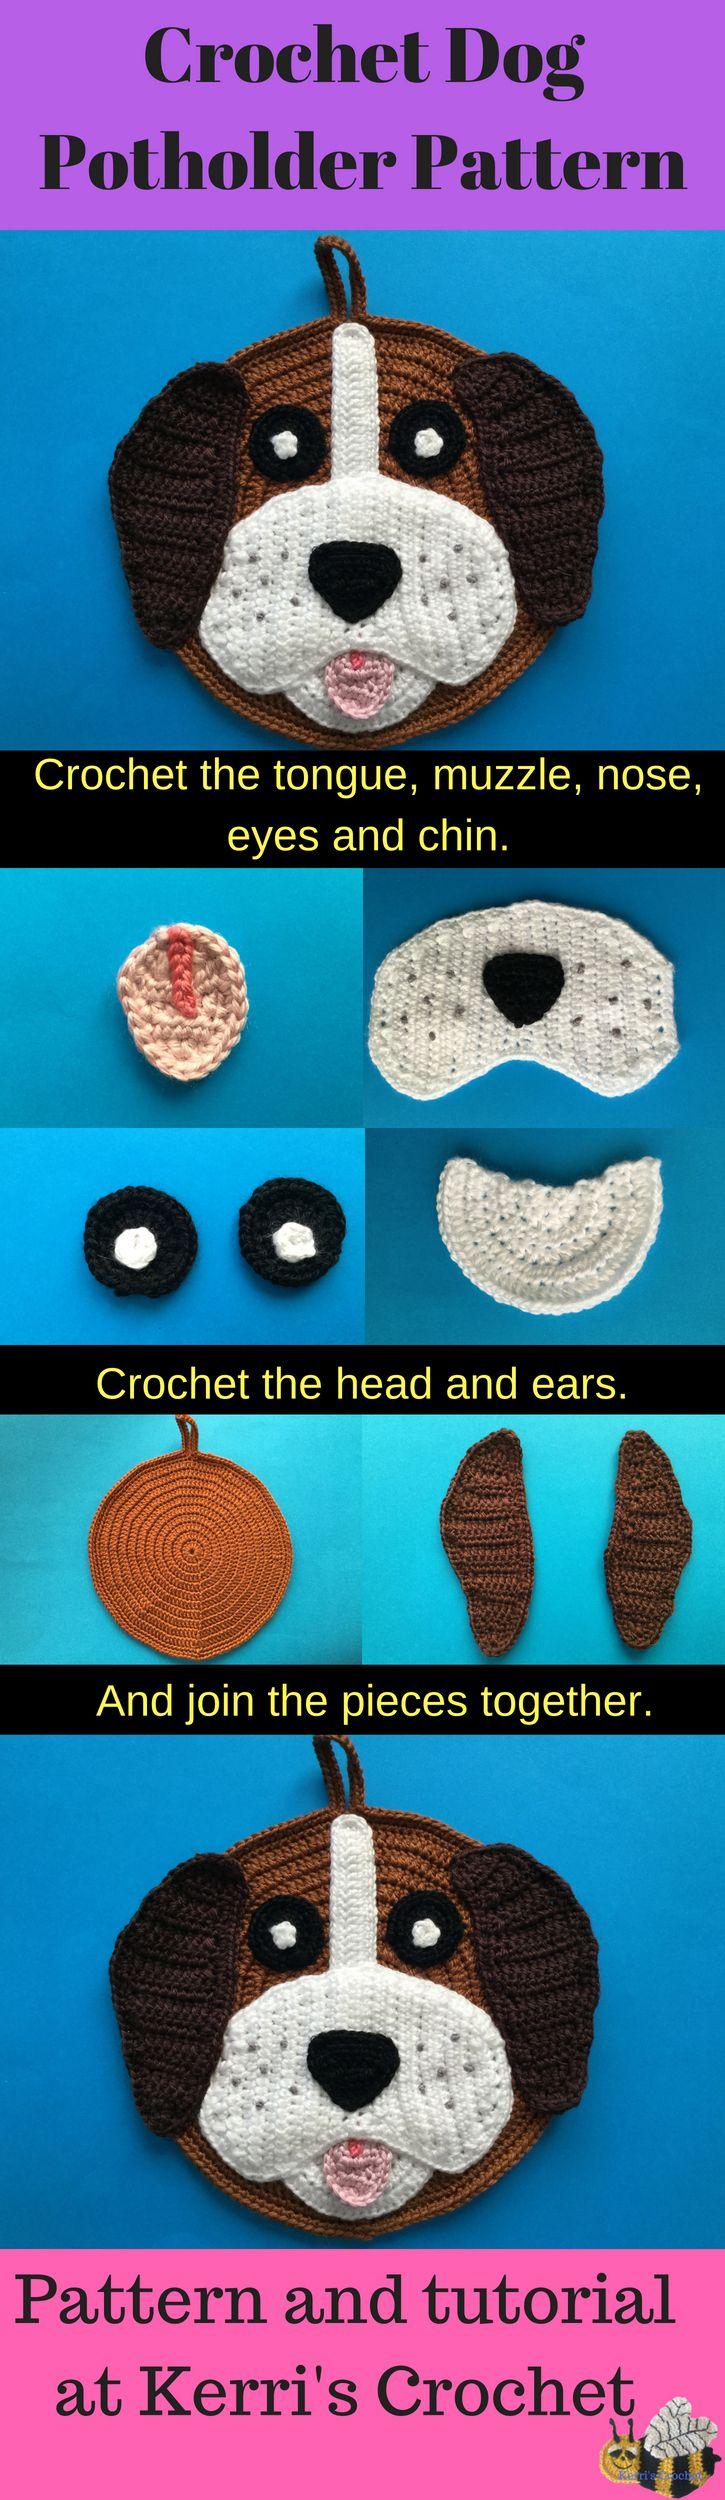 1367 besten Crochet Dishcloths/Potholders Bilder auf Pinterest ...